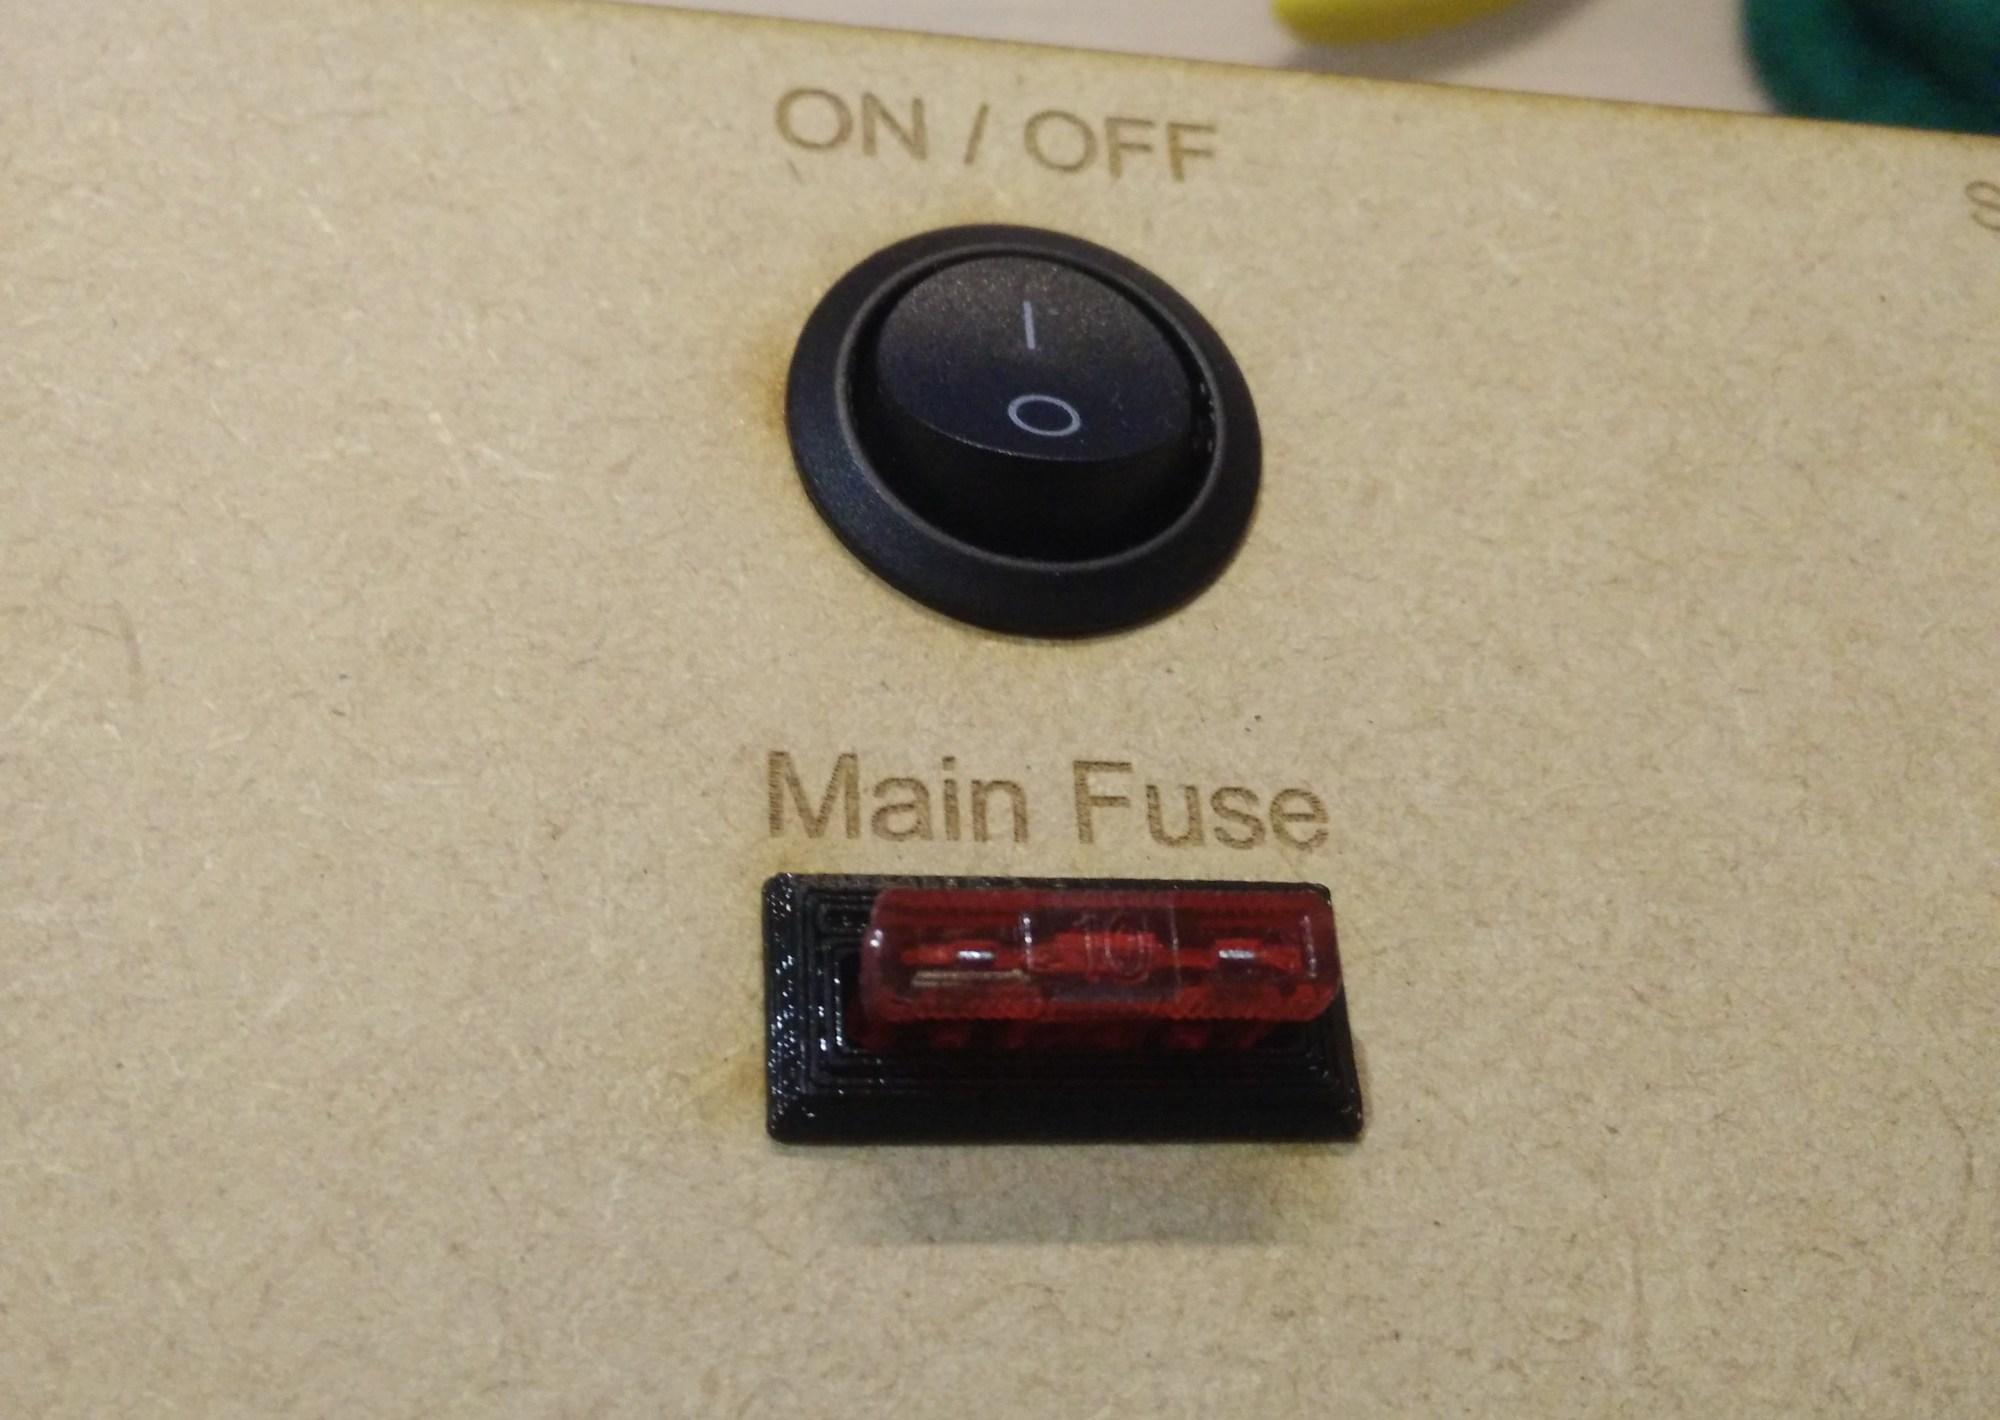 hight resolution of panel mount blade fuse holder car fuse by mrhaza dec 25 2018 view original